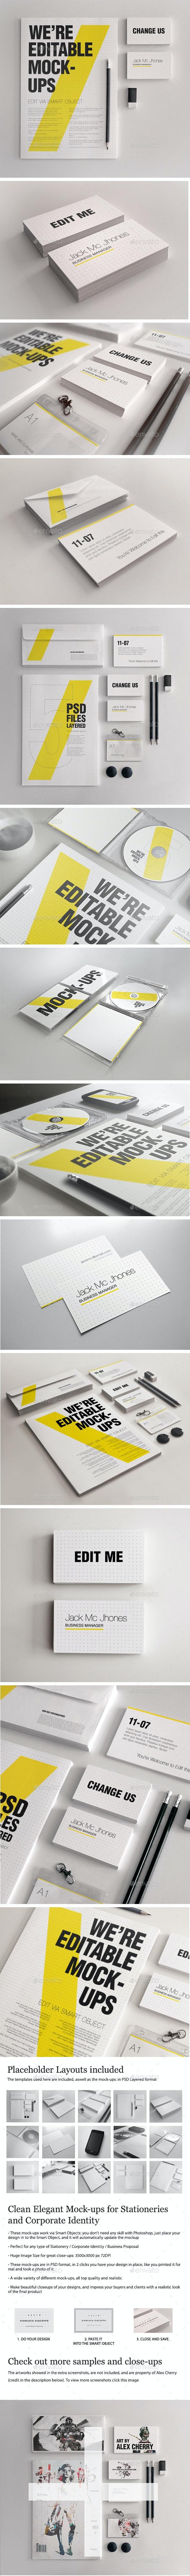 15 Elegant Mock-ups Bundle - Business Corporate ID - Stationery Print